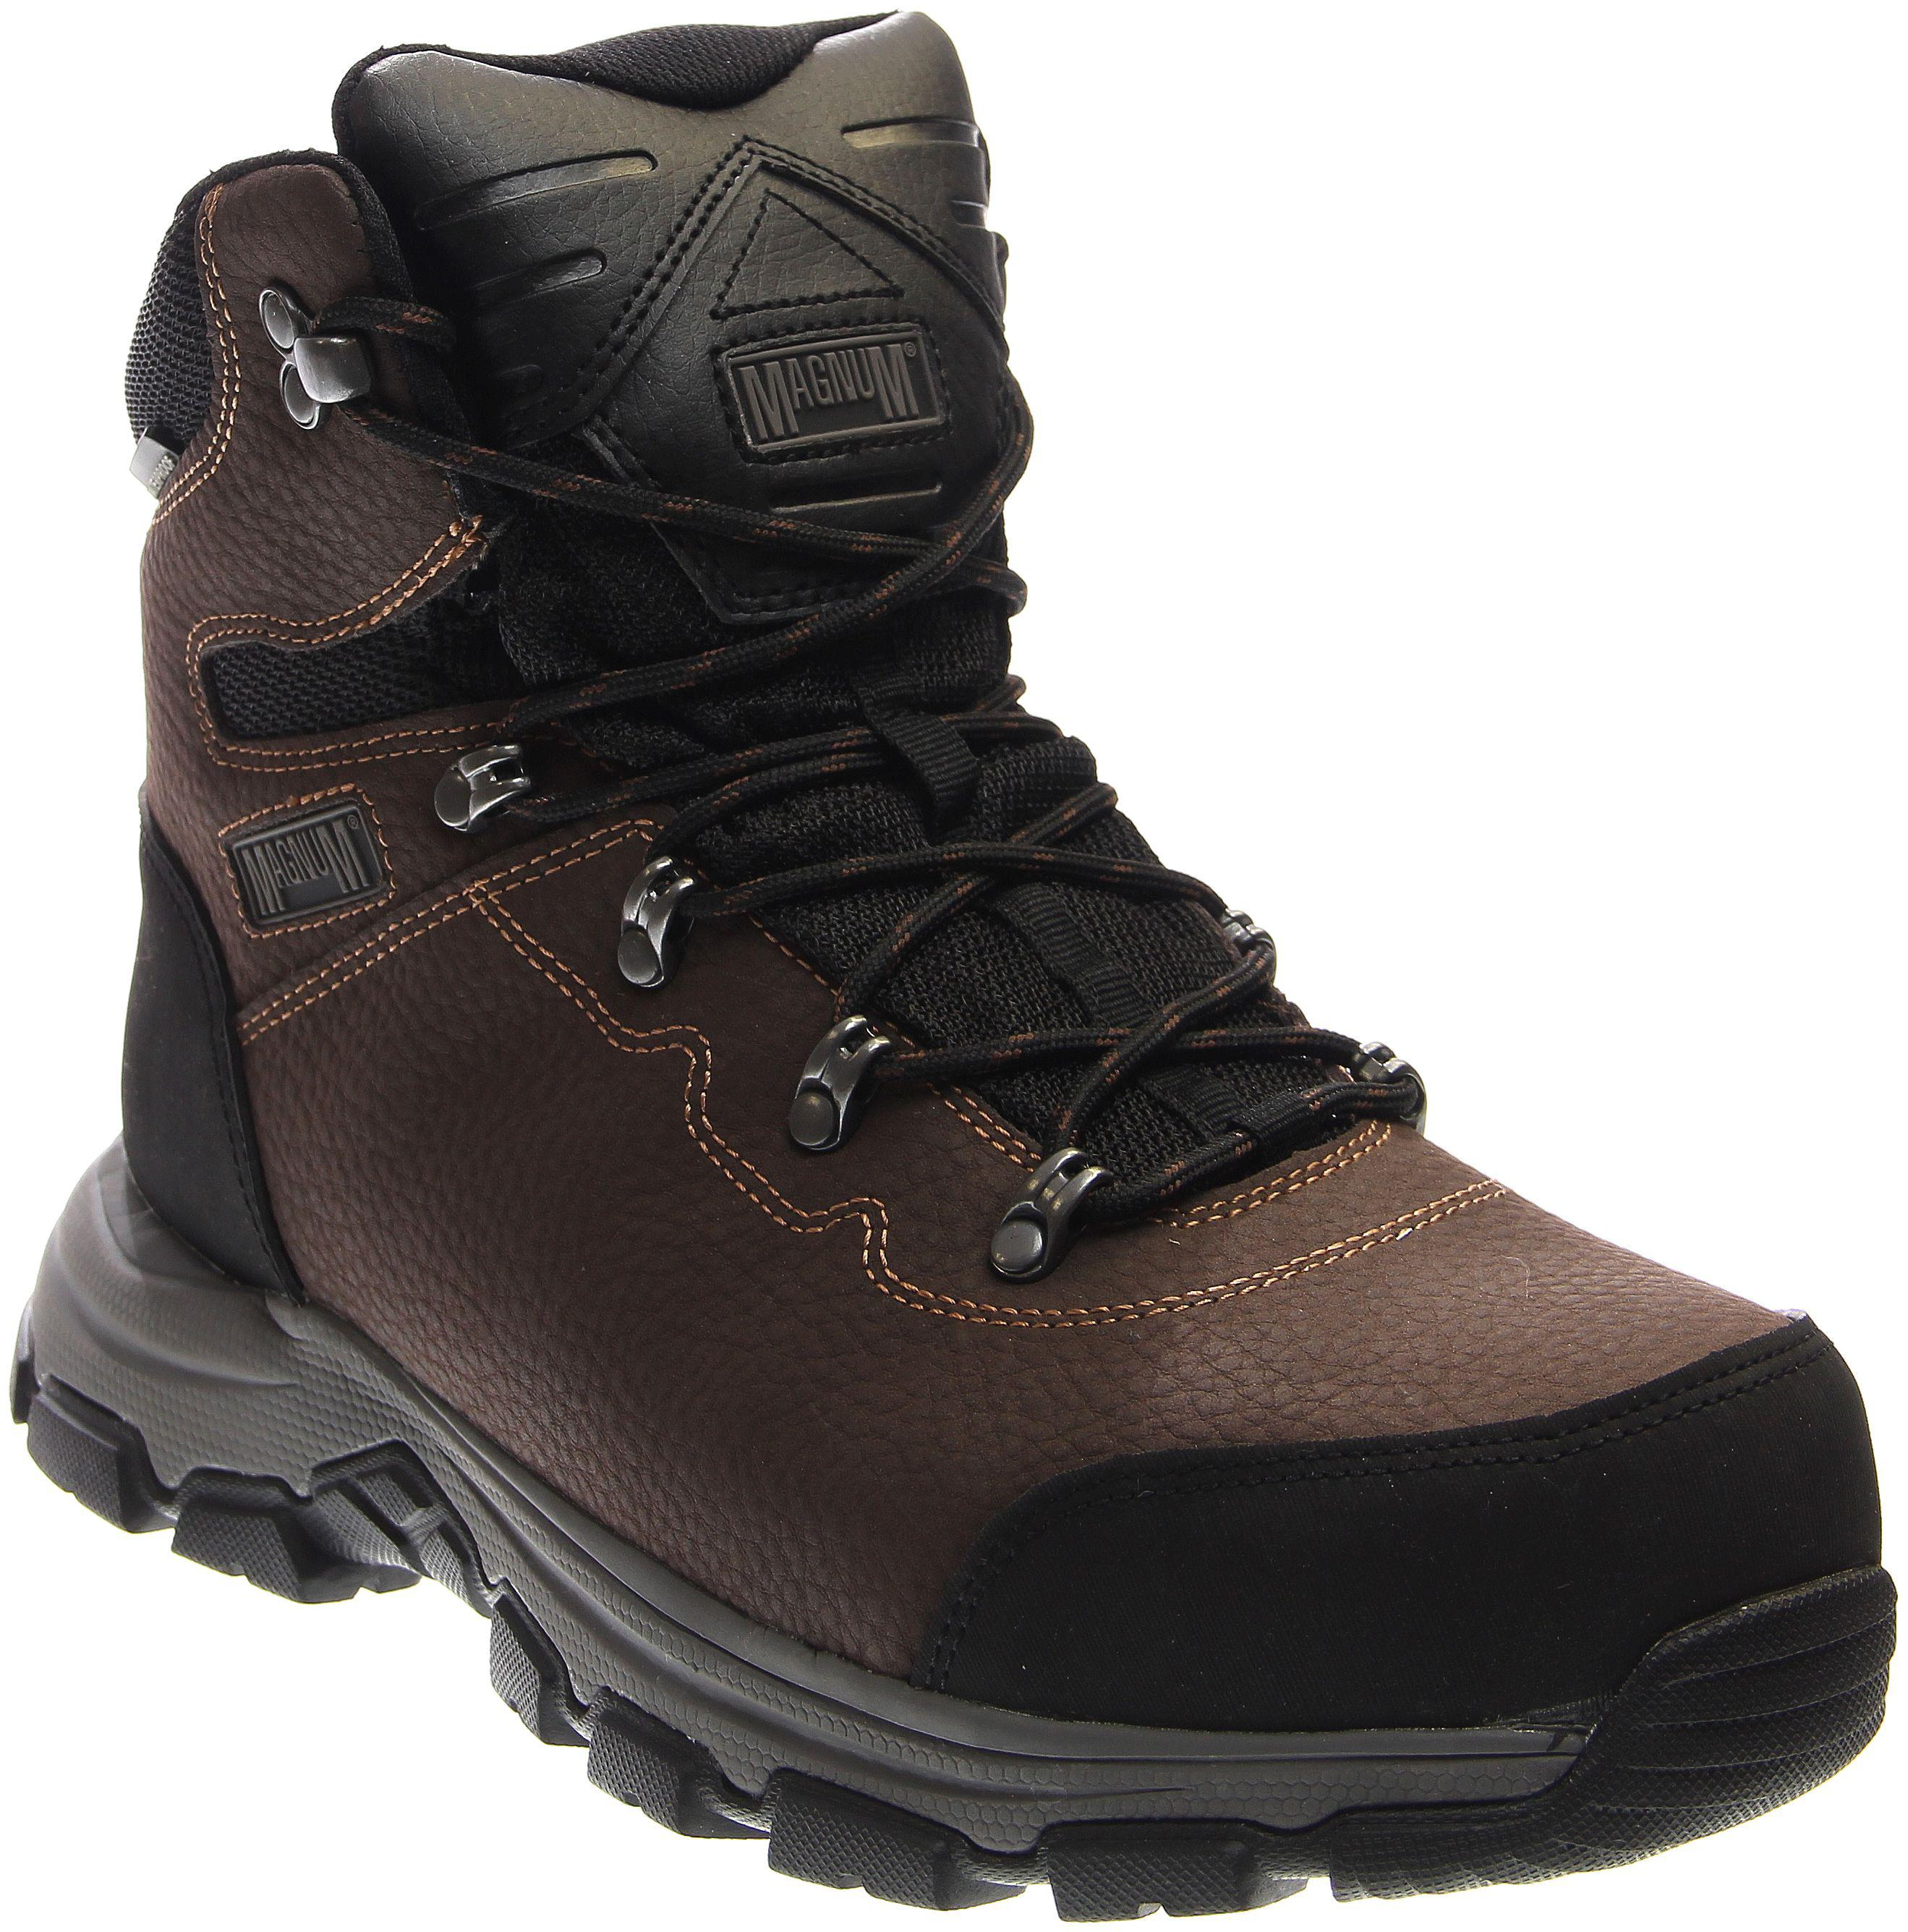 4f07d7abe05 Lyst - Magnum Men's Austin Mid Waterproof Steel Toe Work Boots in ...